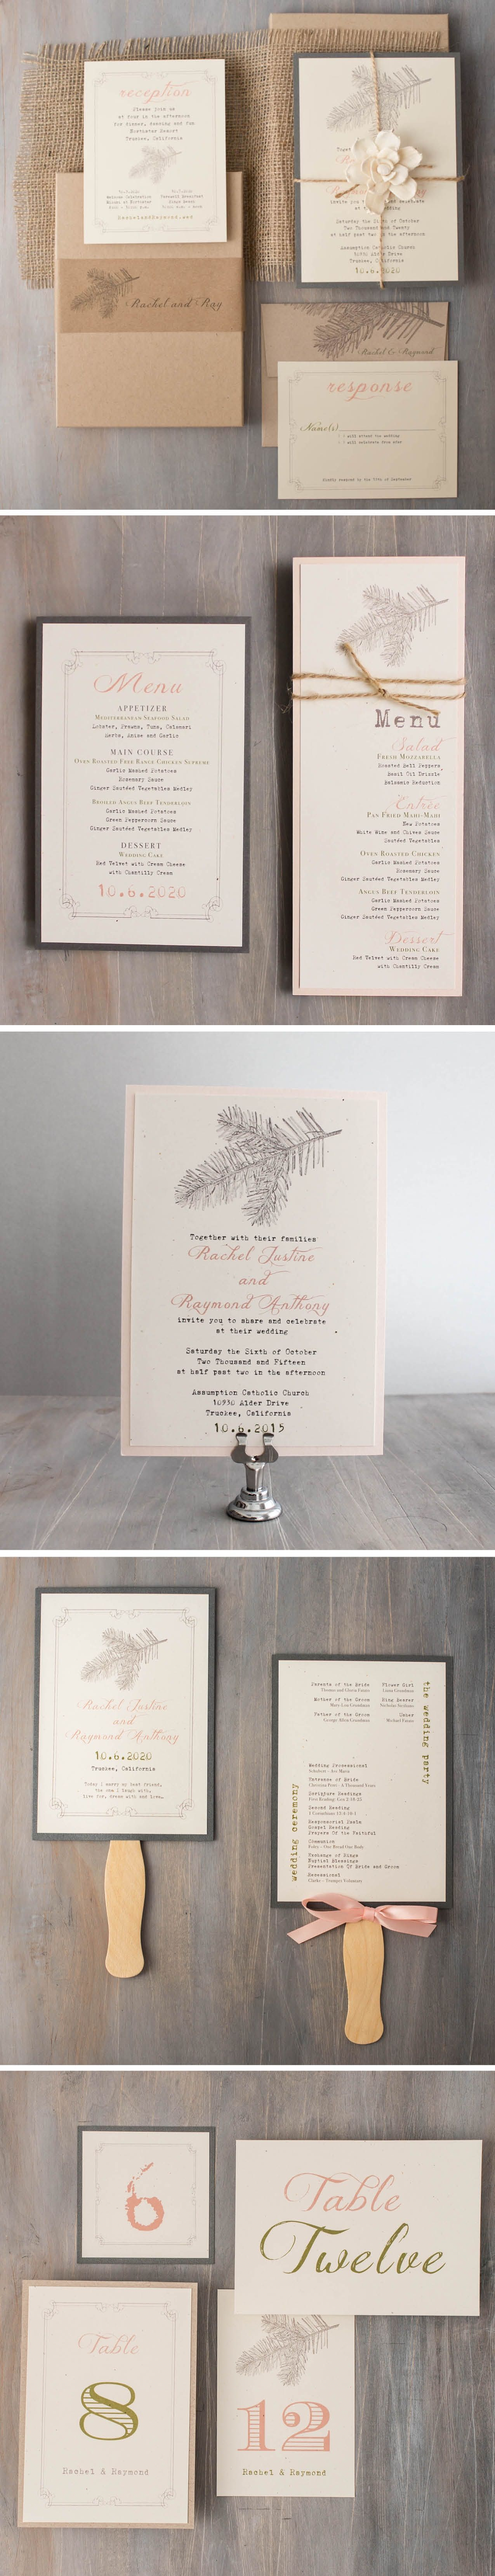 birdcage wedding invitation template%0A Rustic inspired blush  taupe  u     moss green wedding invitations    Customizable   Beacon Lane